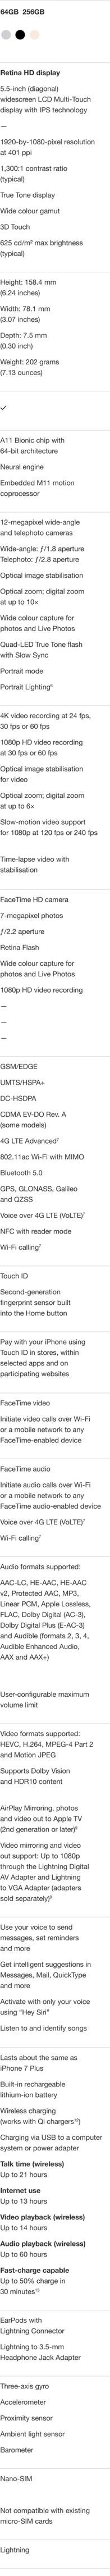 iPhone 8 Plus Specifications